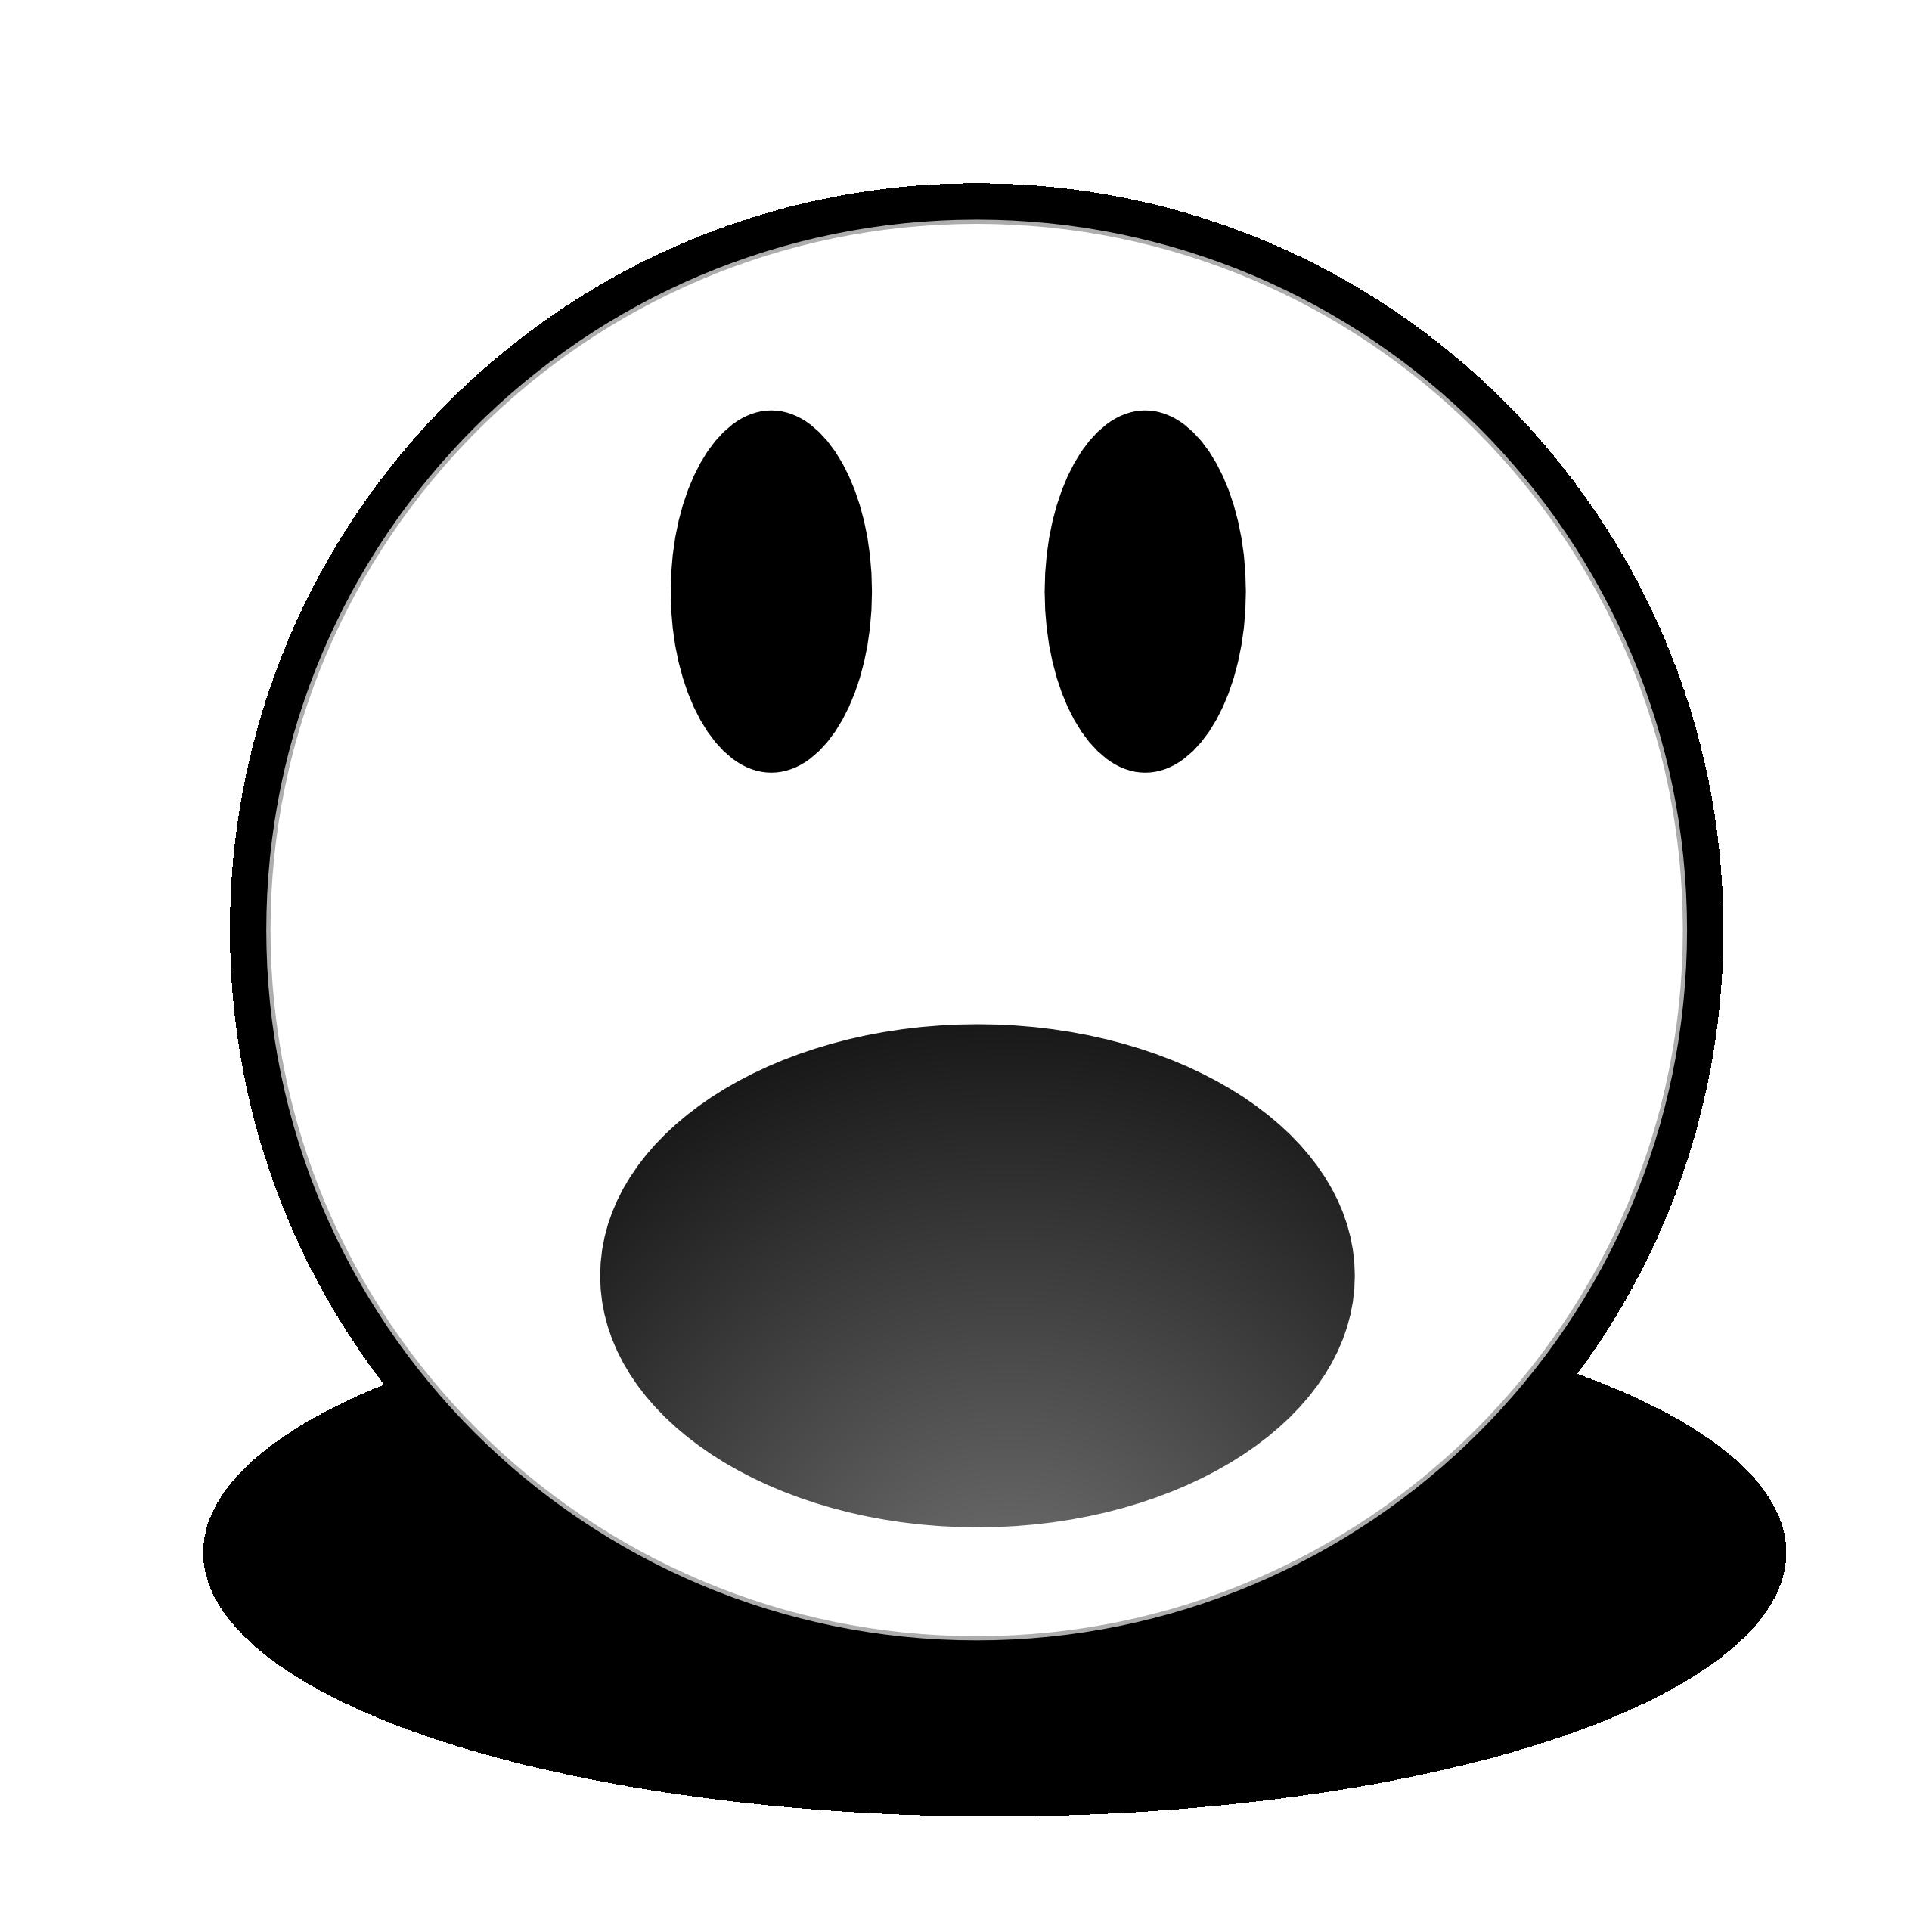 Transparent black and white worried emoji clipart